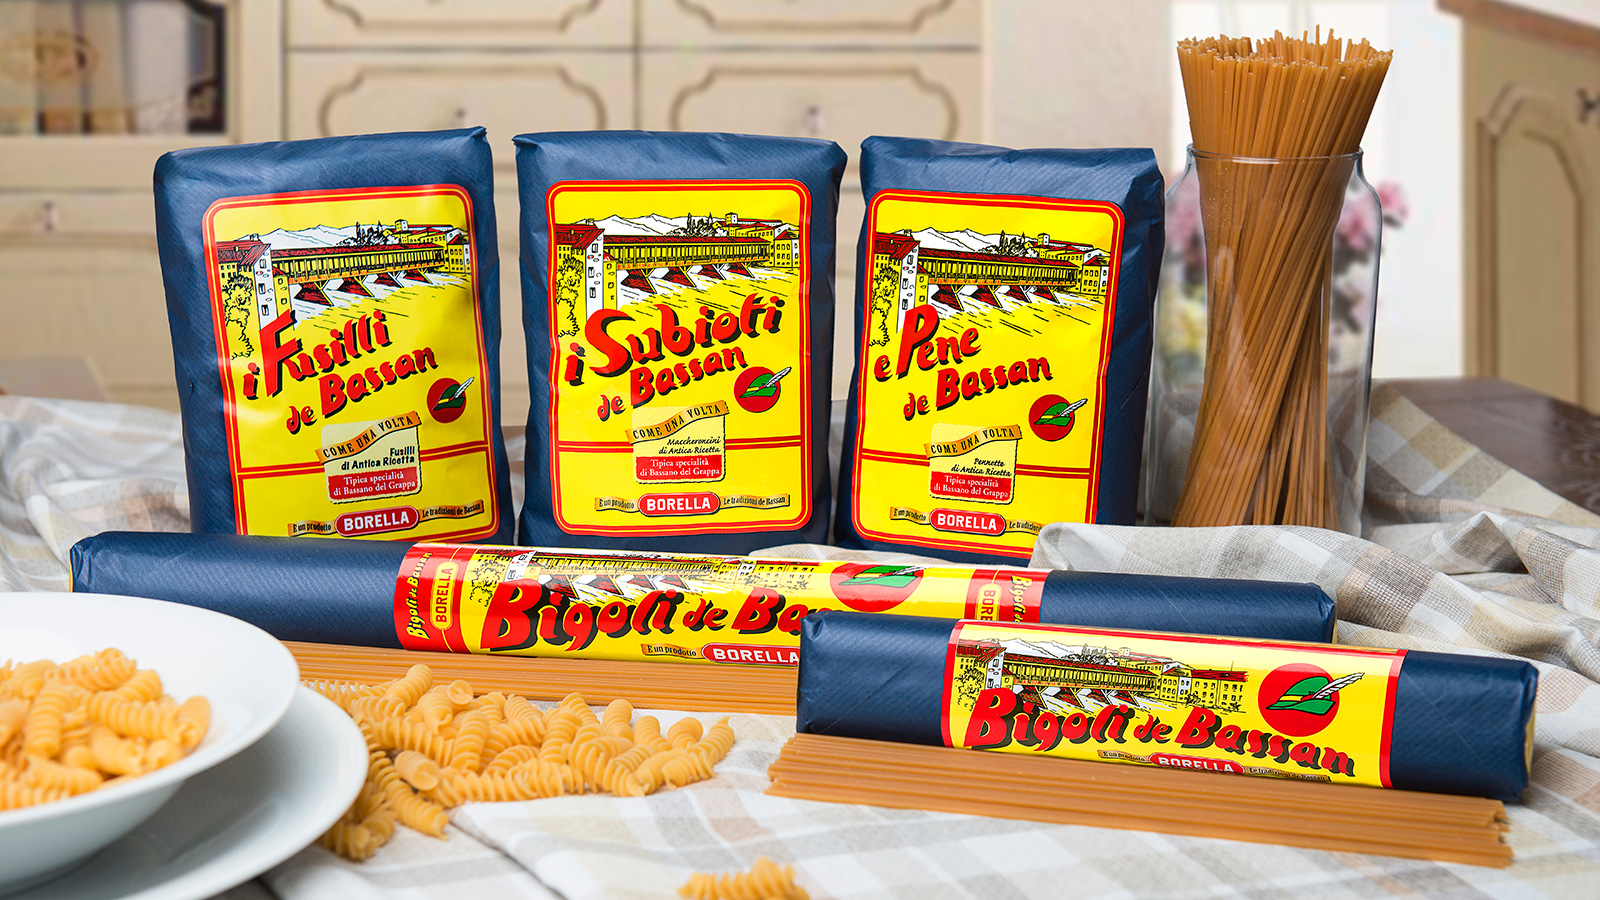 pasta borella bigoli de bassan incartati